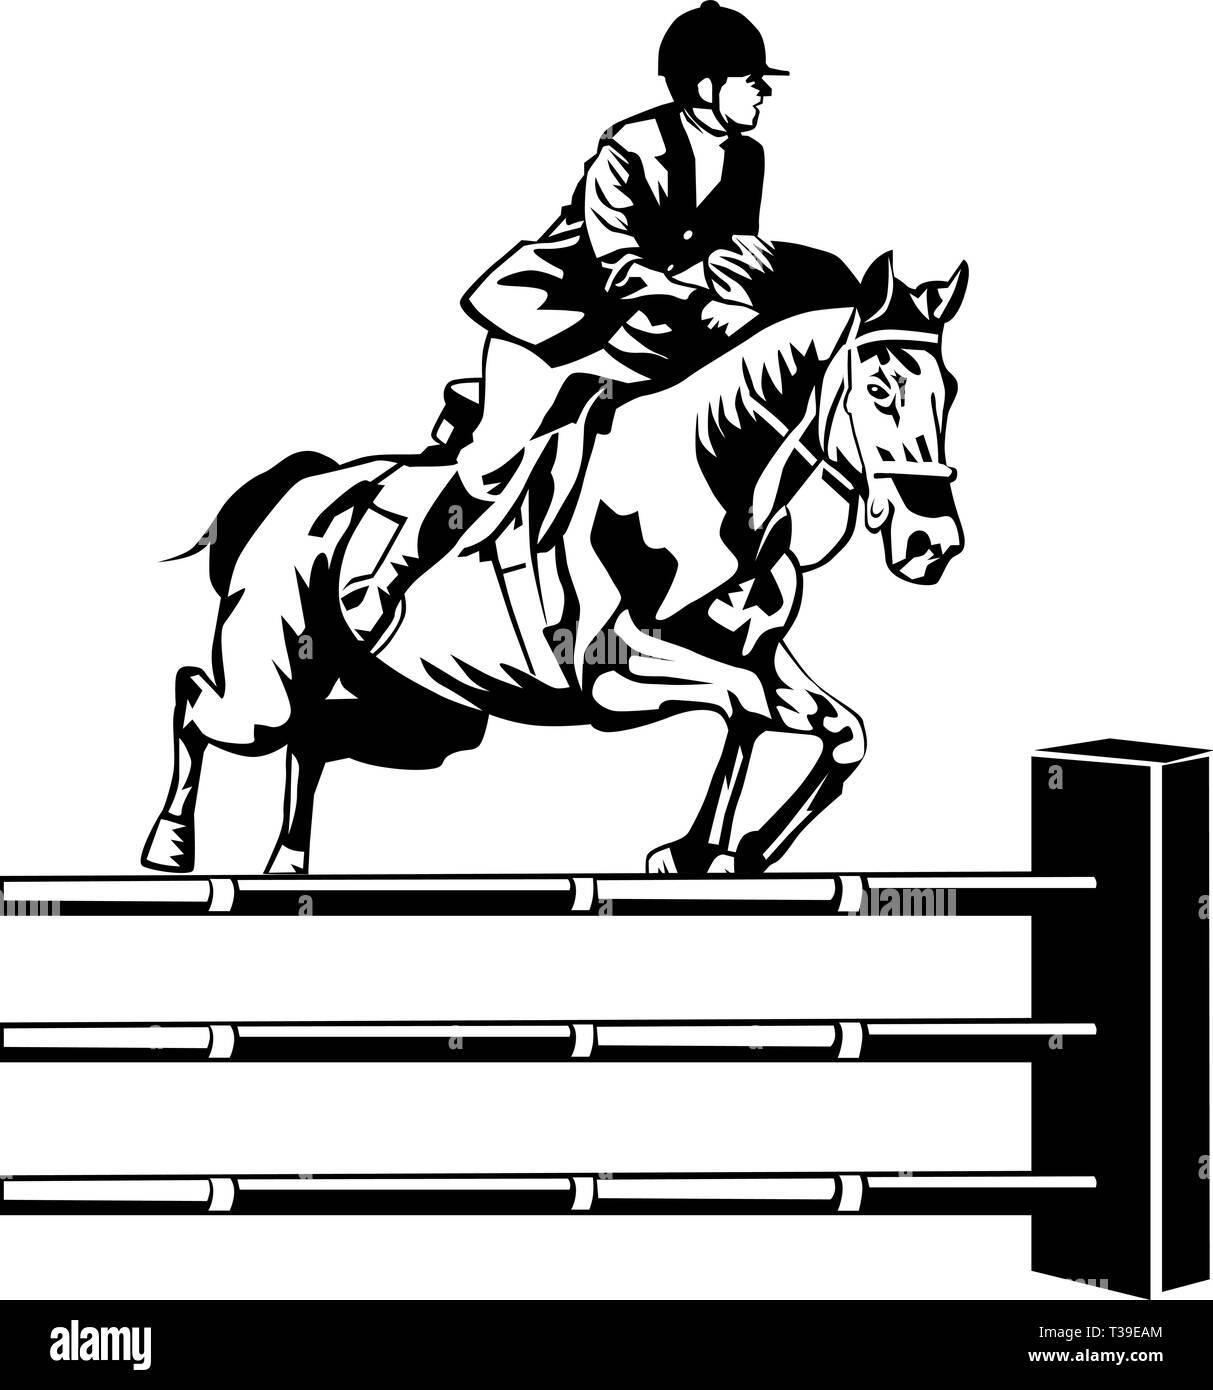 Horse Jumping Vector Illustration Stock Vector Image Art Alamy